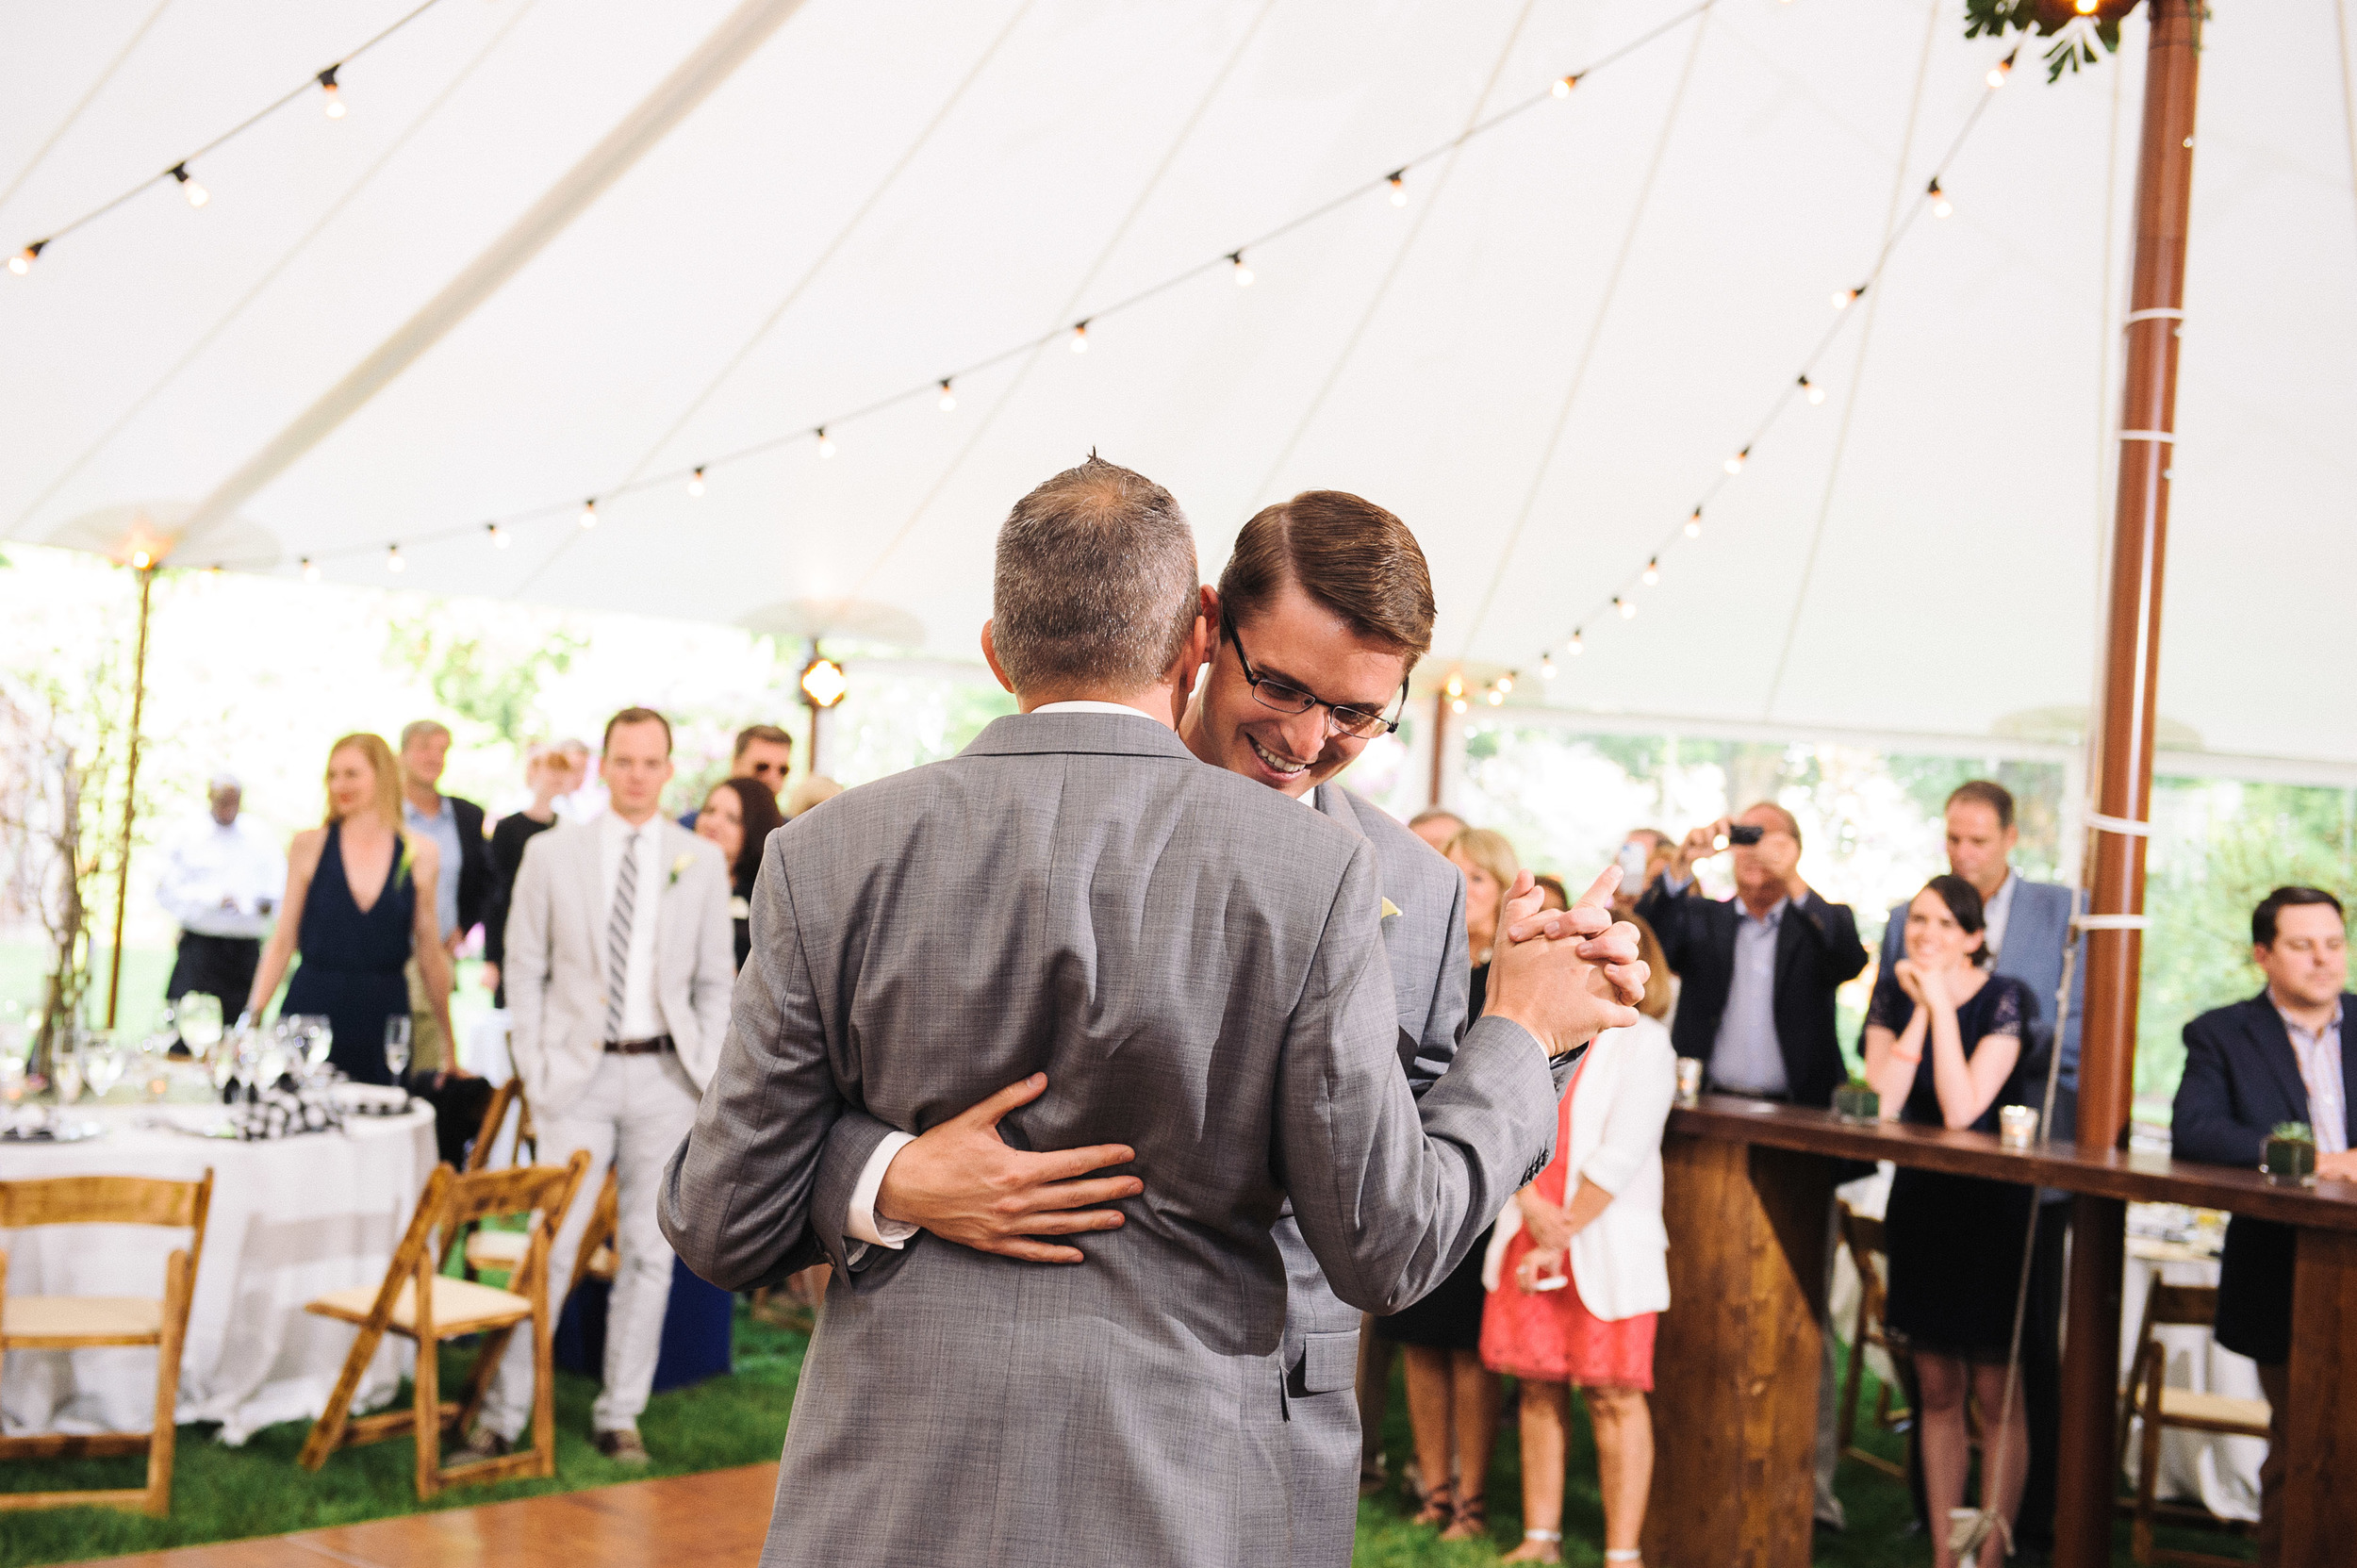 Aviation Themed Wedding Gay Wedding LGBT005.JPG